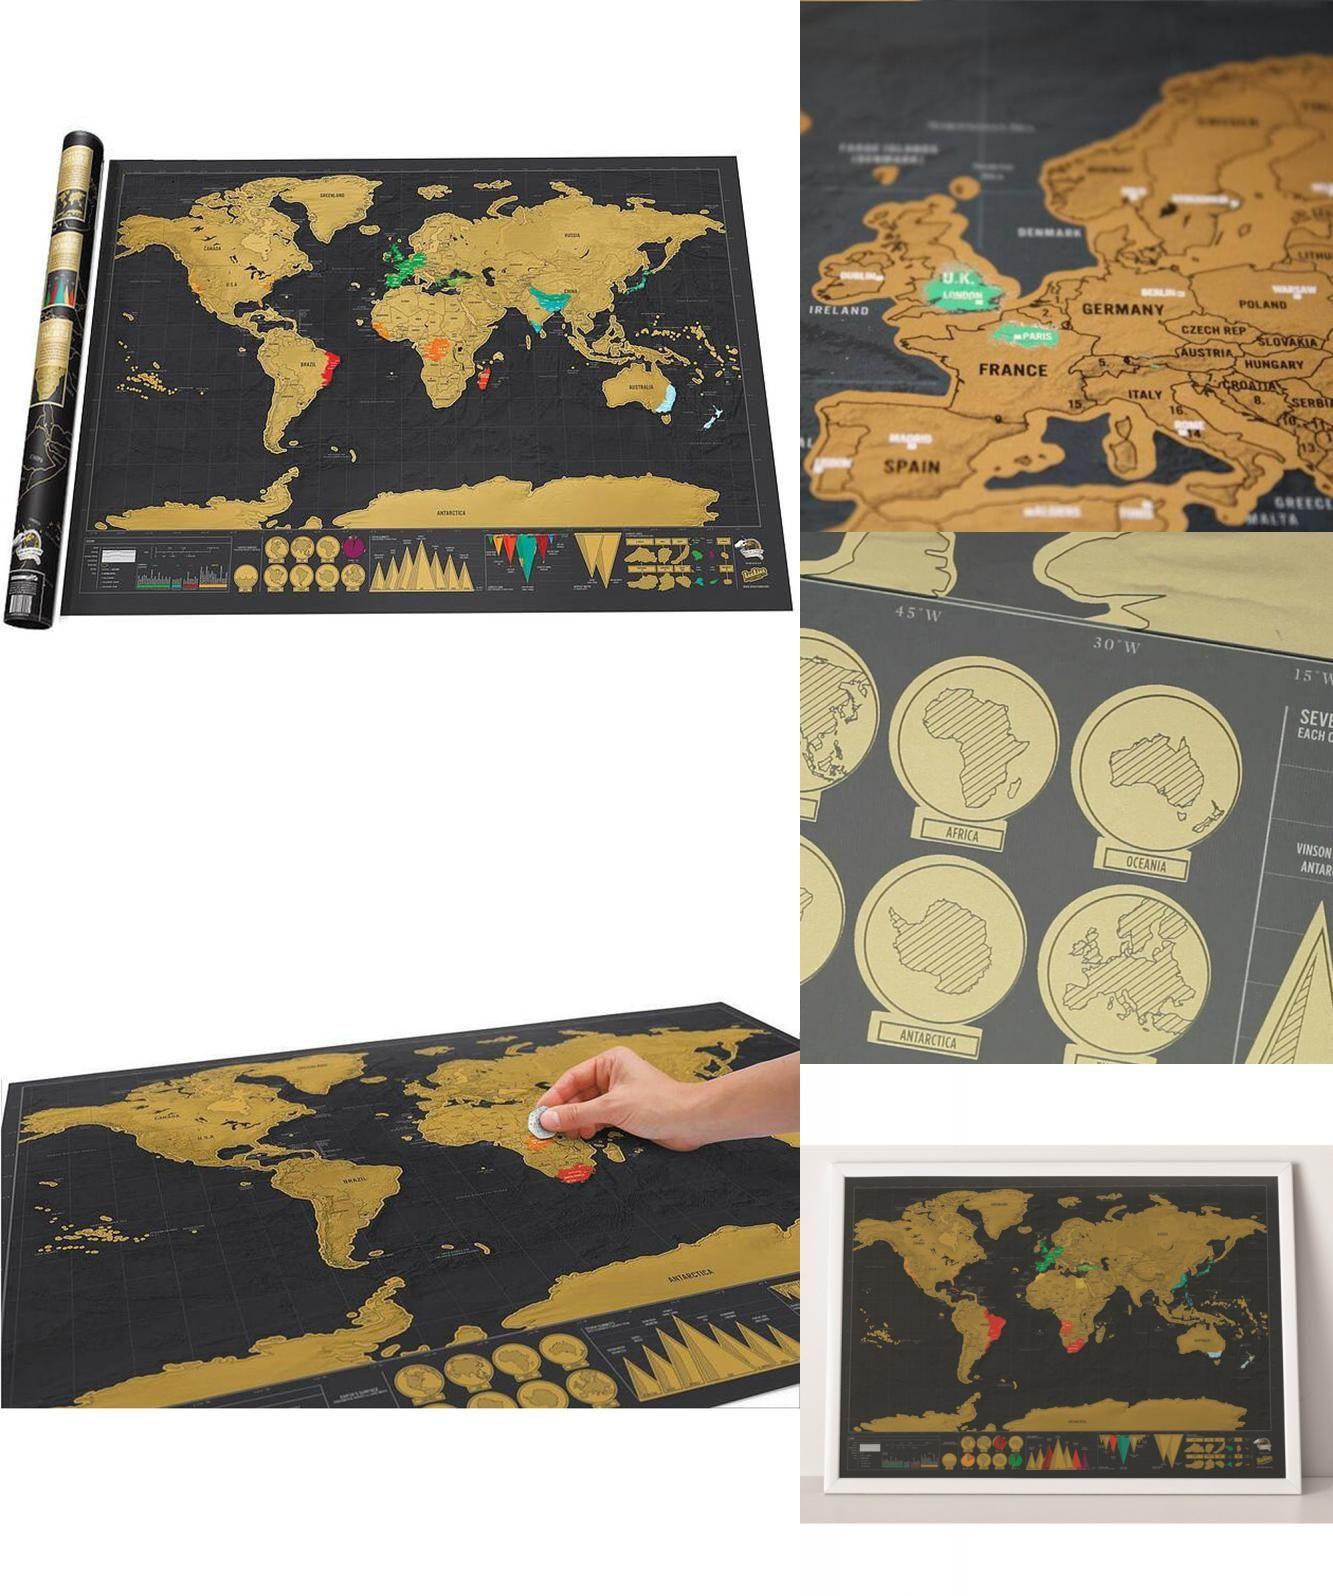 Visit to buy luxury edition black world map new design black visit to buy luxury edition black world map new design black deluxe scratch map gumiabroncs Choice Image